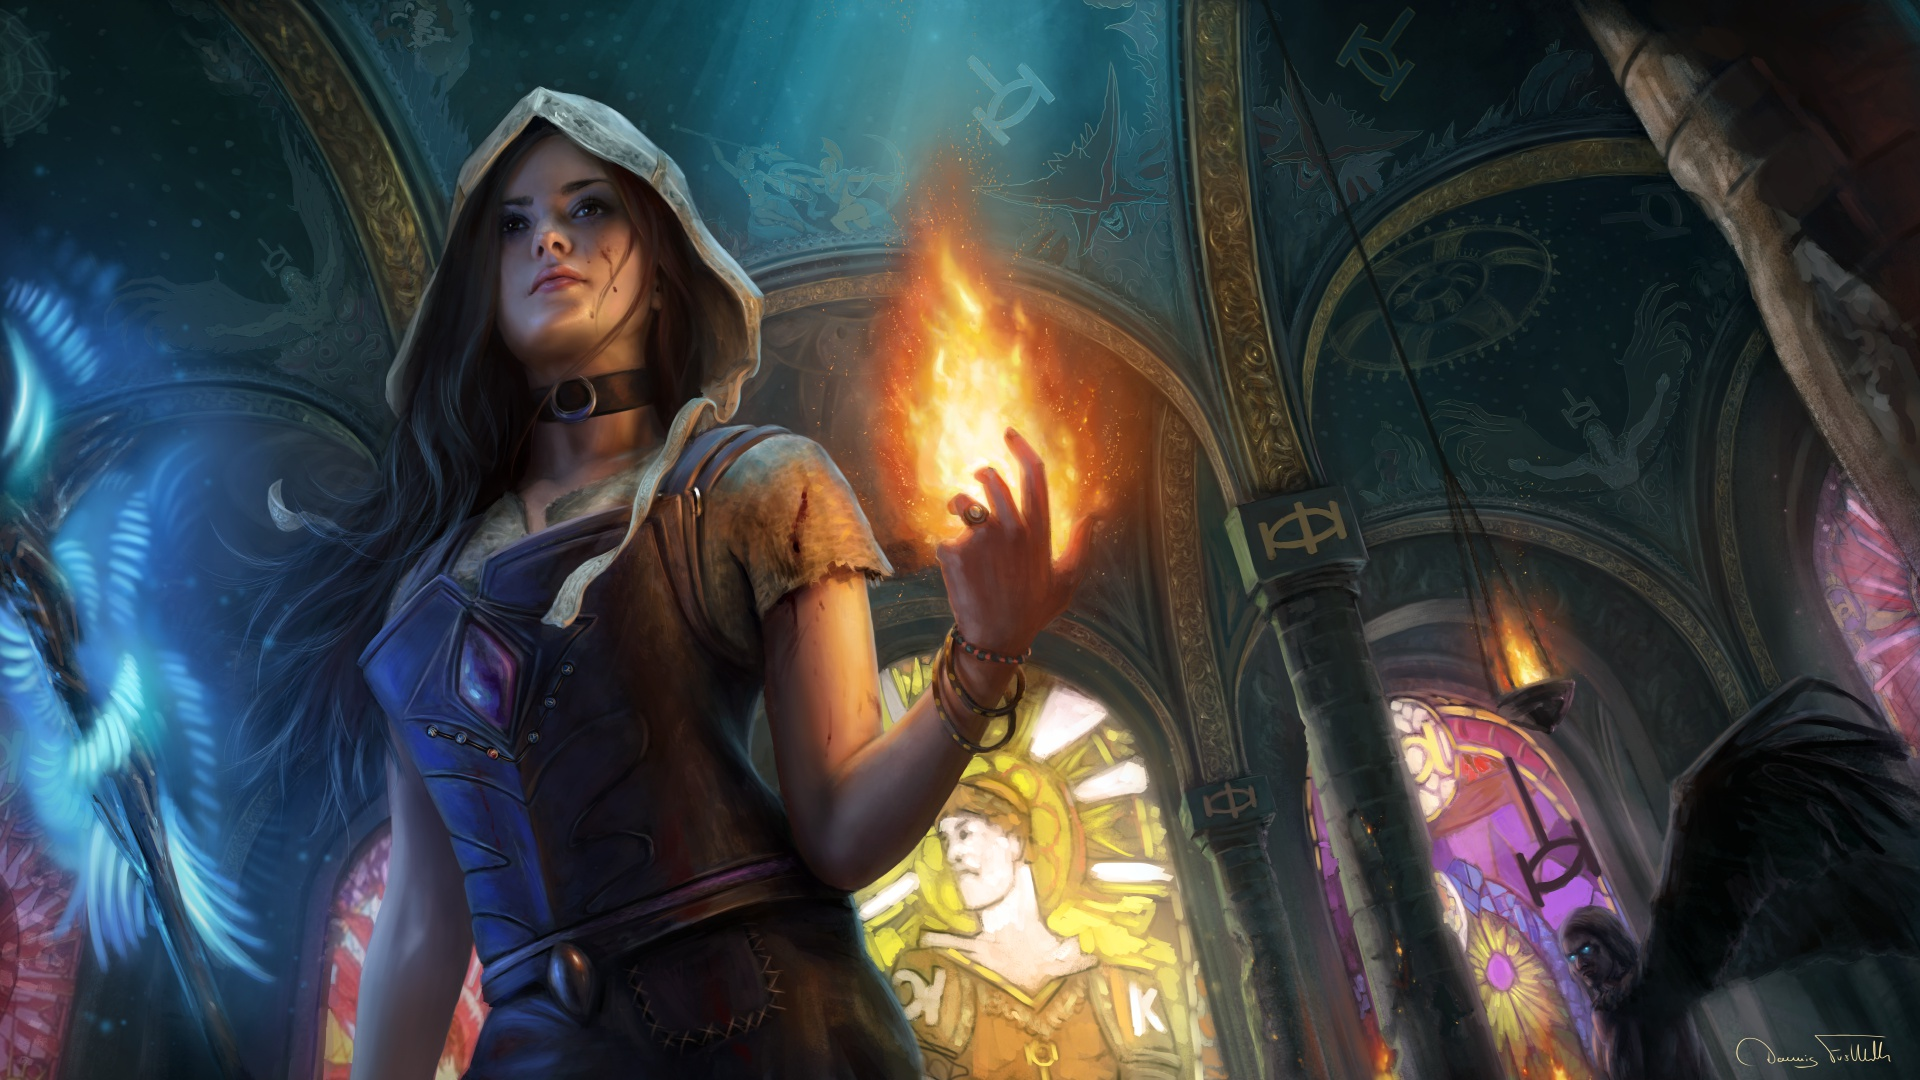 Path Of Exile Fantasy Girl Artwork, HD Games, 4k